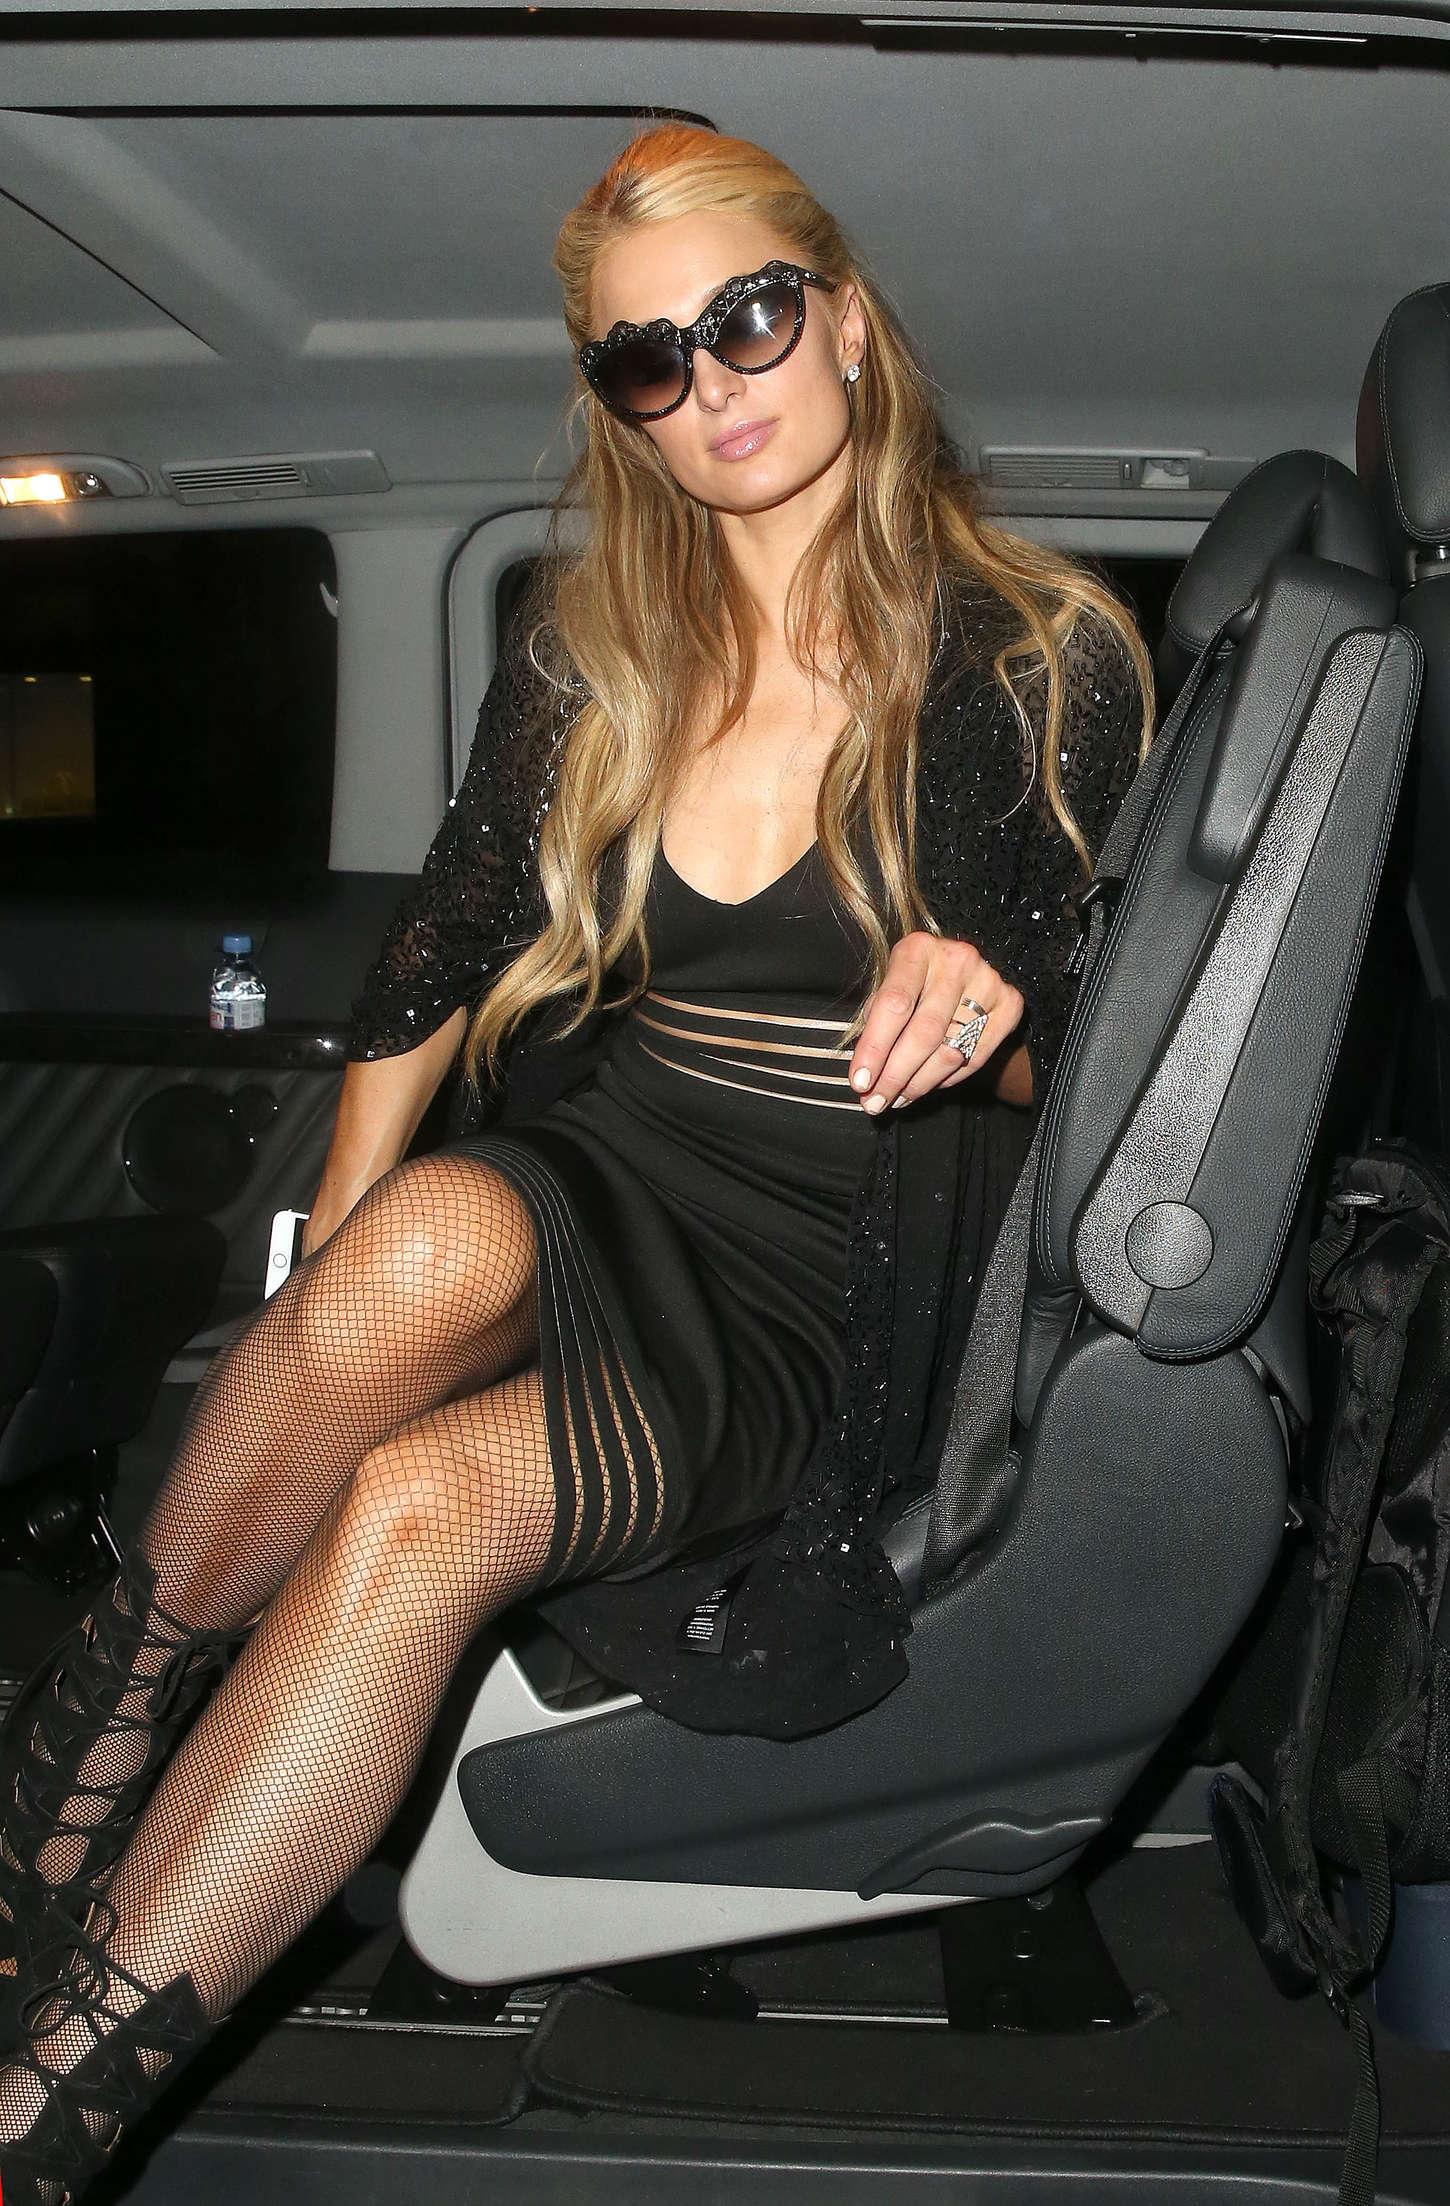 Paris Hilton in Black Dress Arriving at Her Hotel in London